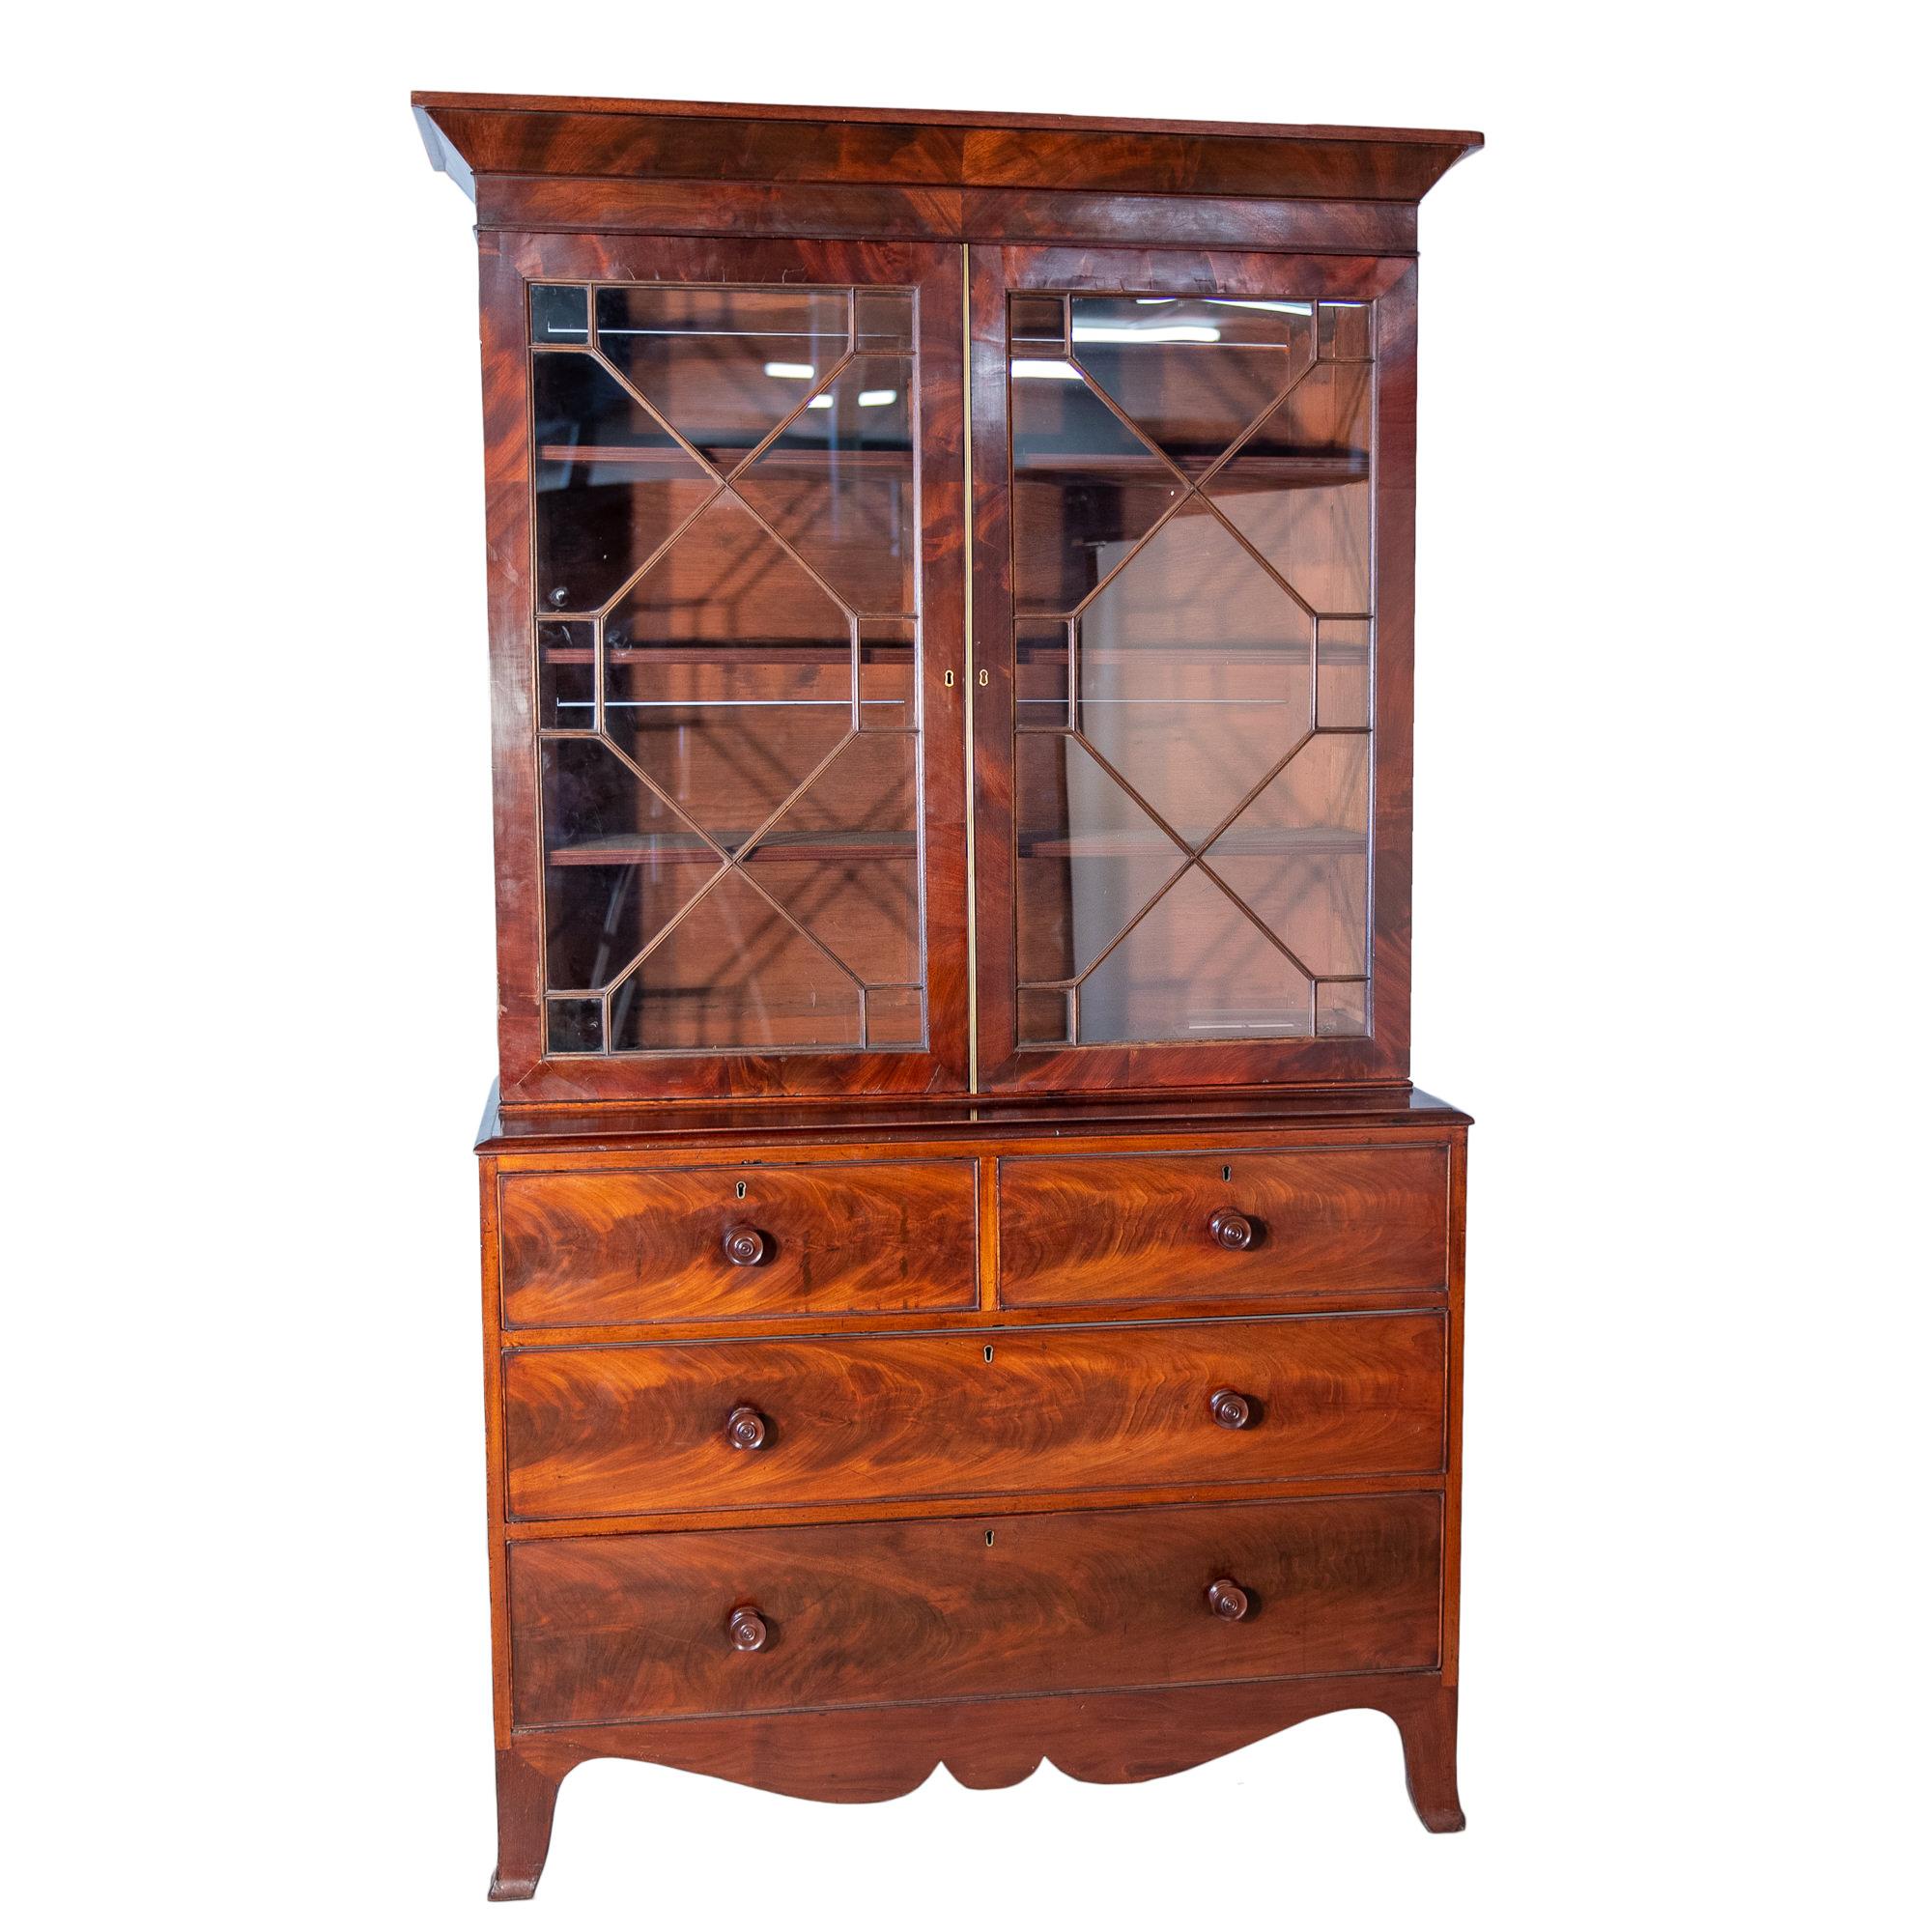 'Georgian Astragal Glazed Flame Mahogany Bookcase Early 19th Century'